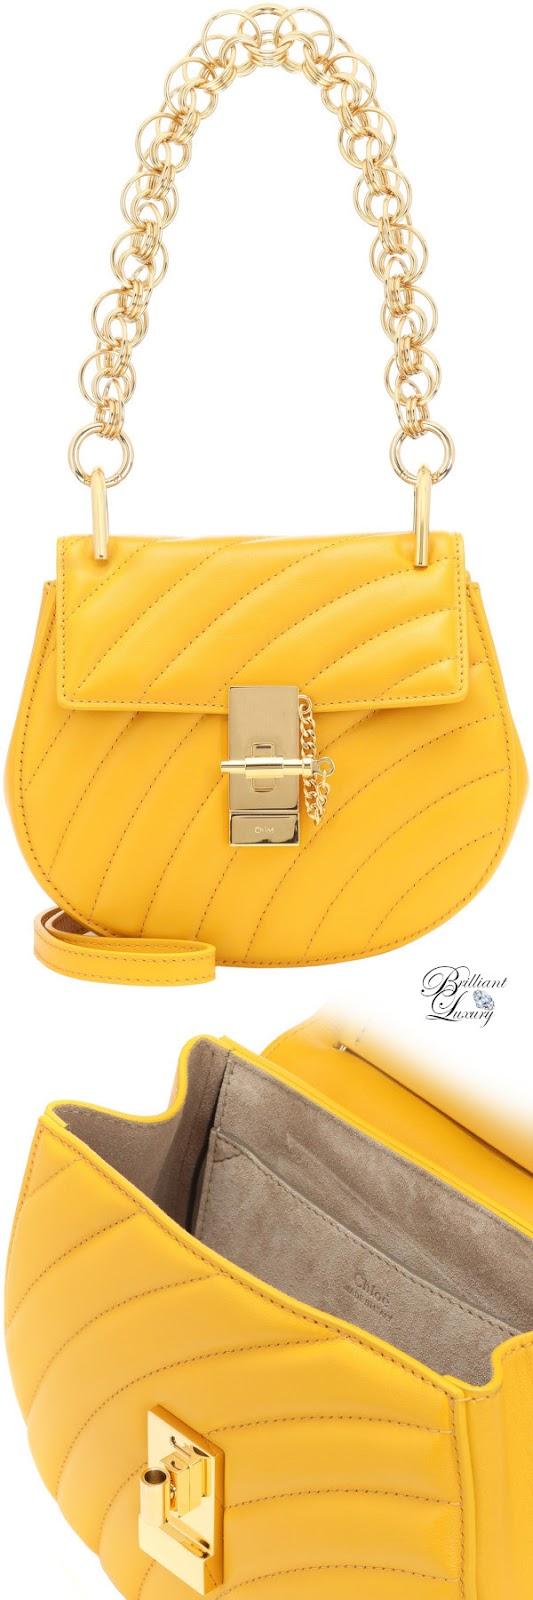 Brilliant Luxury♦Chloé Drew mini bijou shoulder bag in yellow